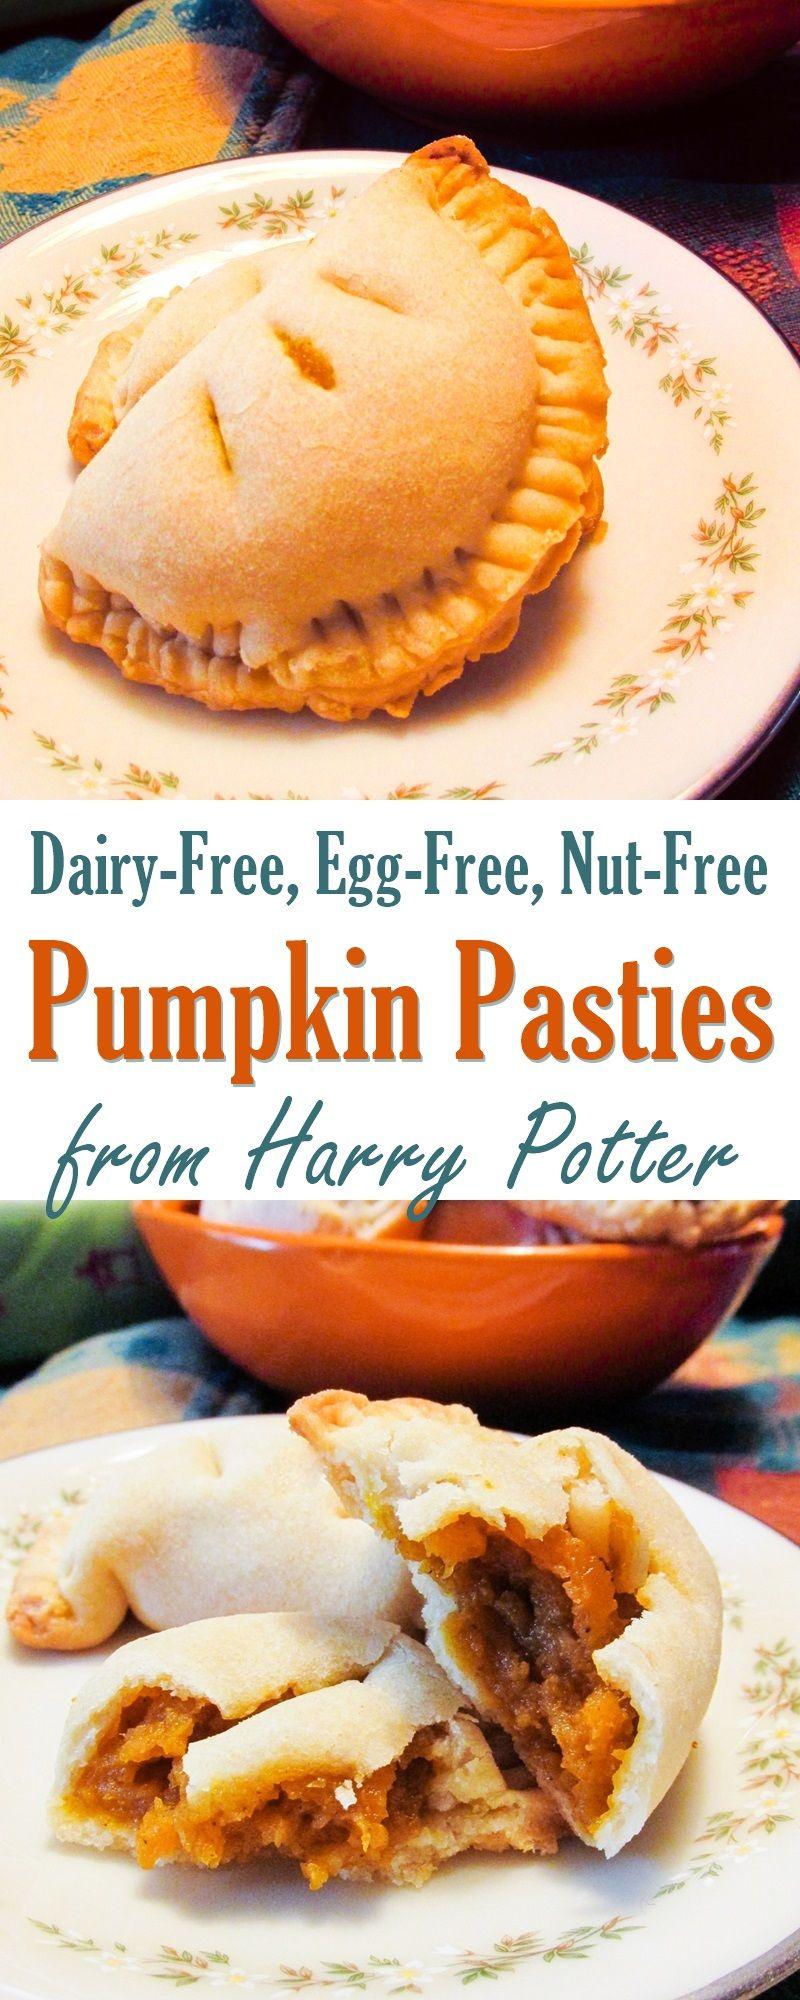 Vegan Pumpkin Pasties Recipe A Harry Potter Favorite Made Dairy Free Recipe Vegan Pumpkin Recipes Vegan Pumpkin Pasties Recipes